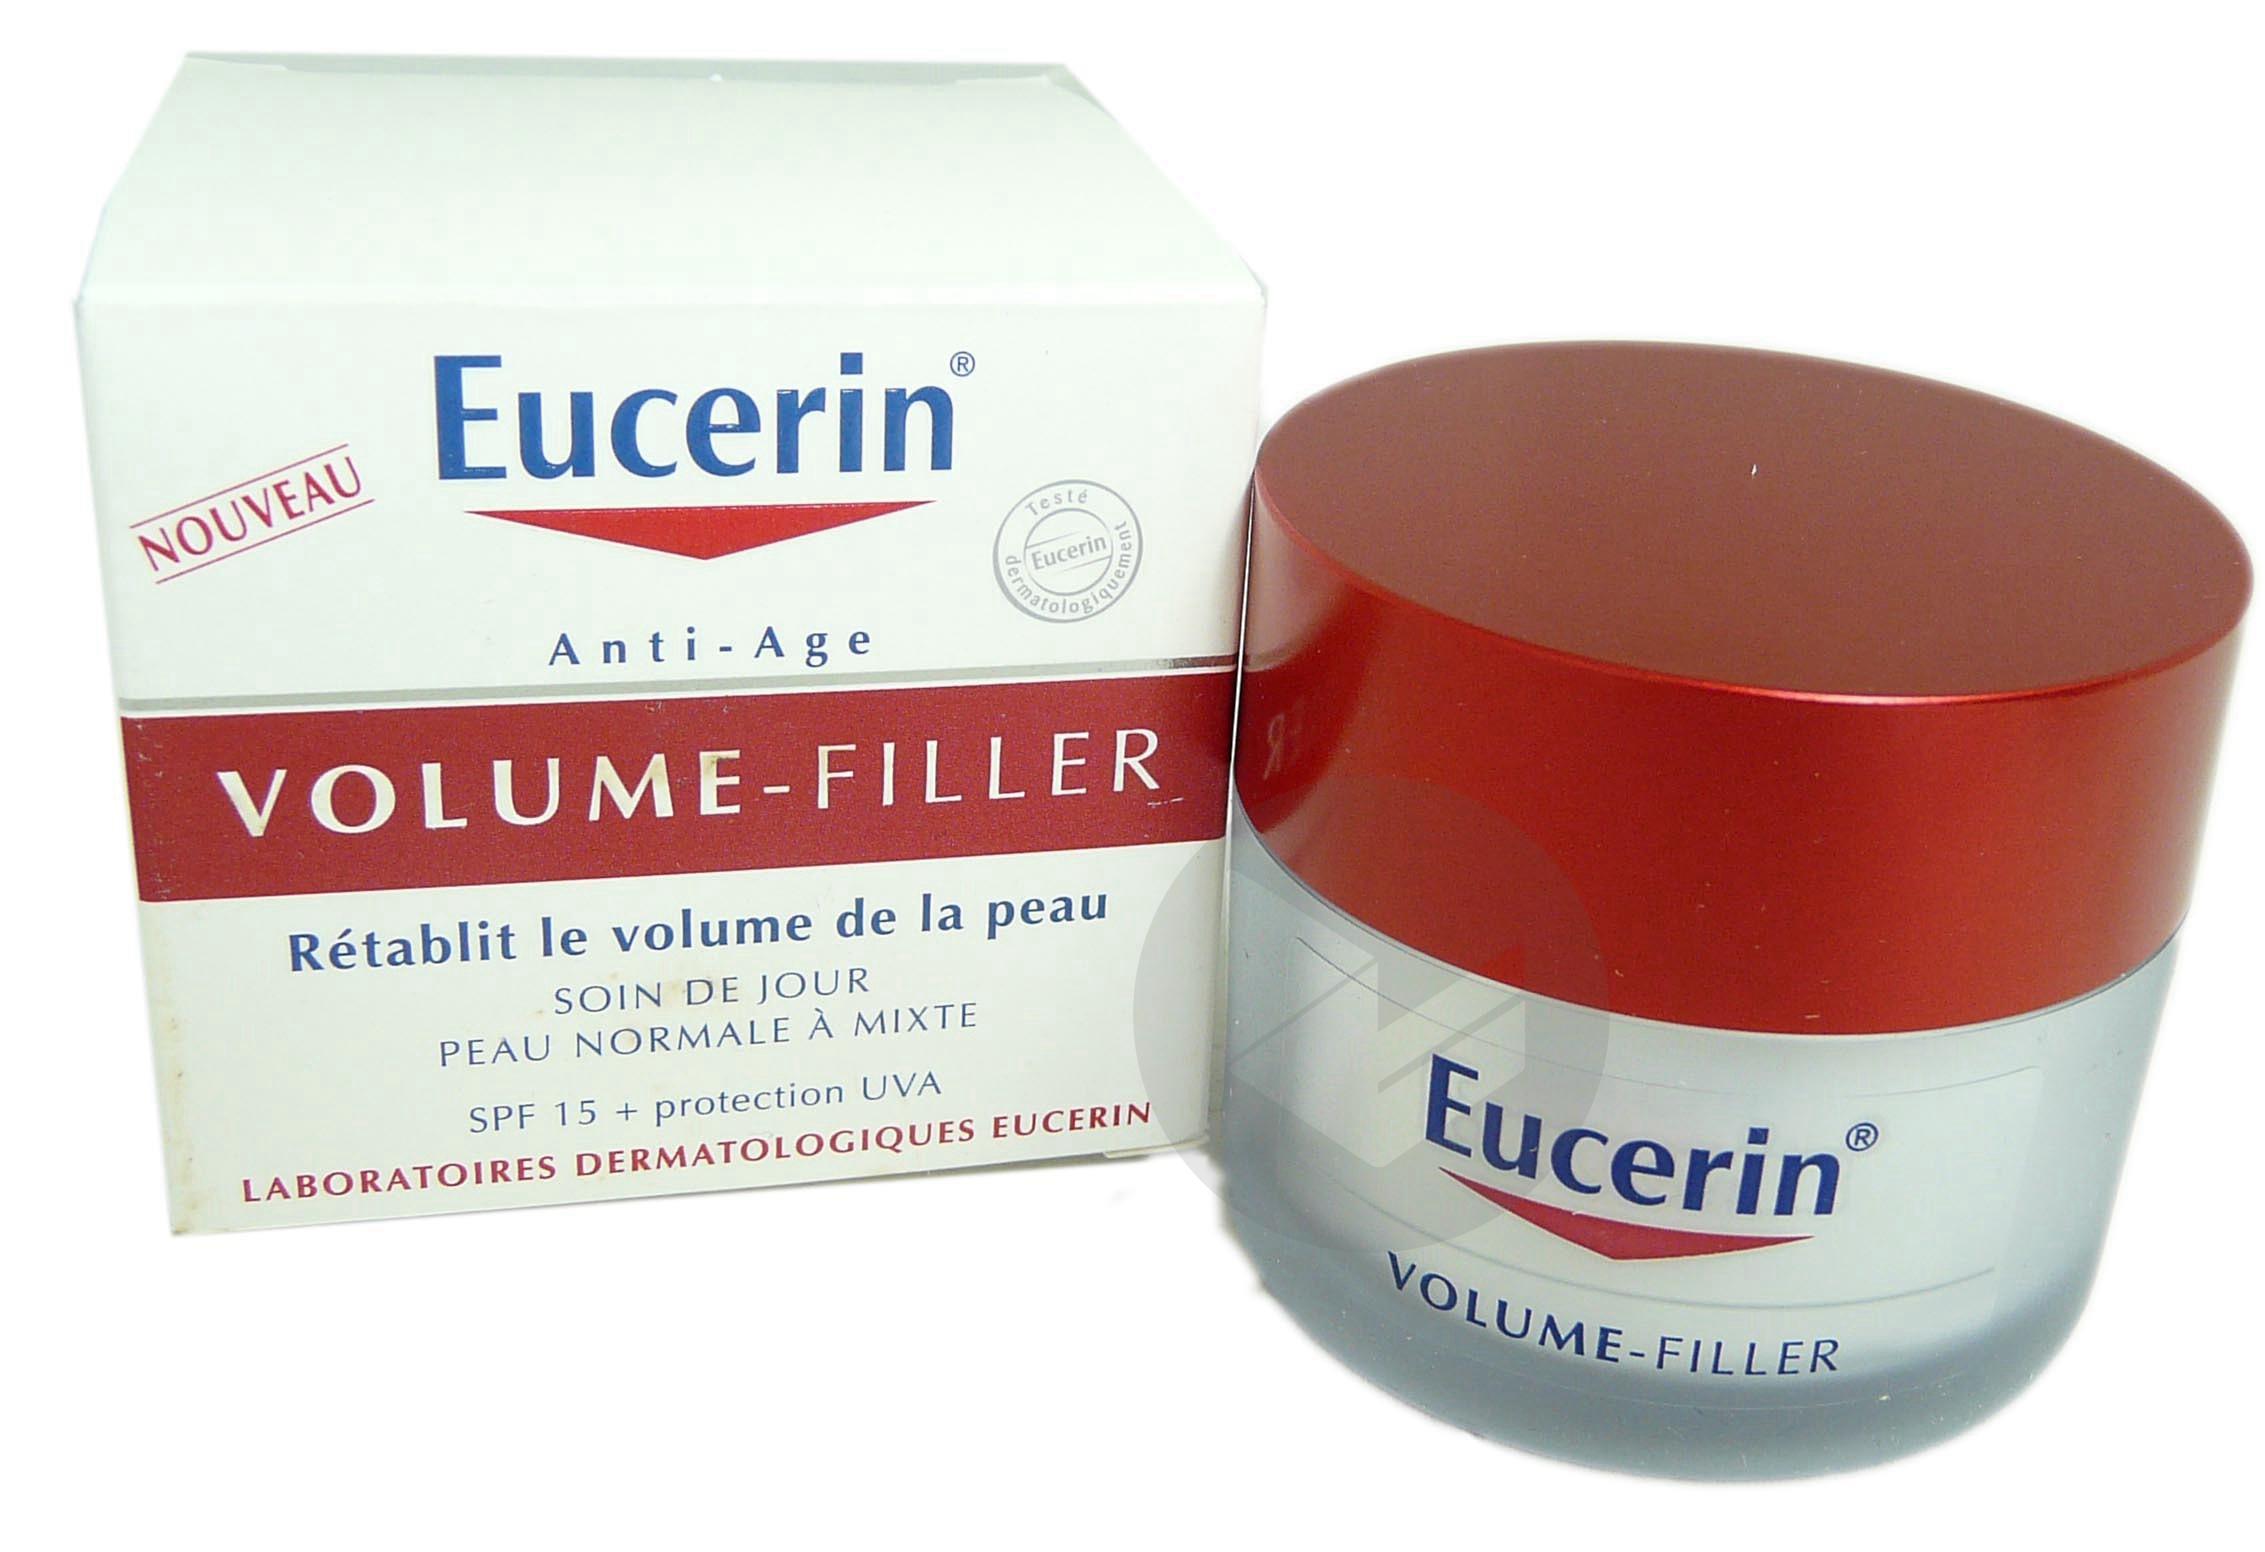 EUCERIN VOLUME-FILLER Cr soin jour peau normale à mixte Pot/50ml